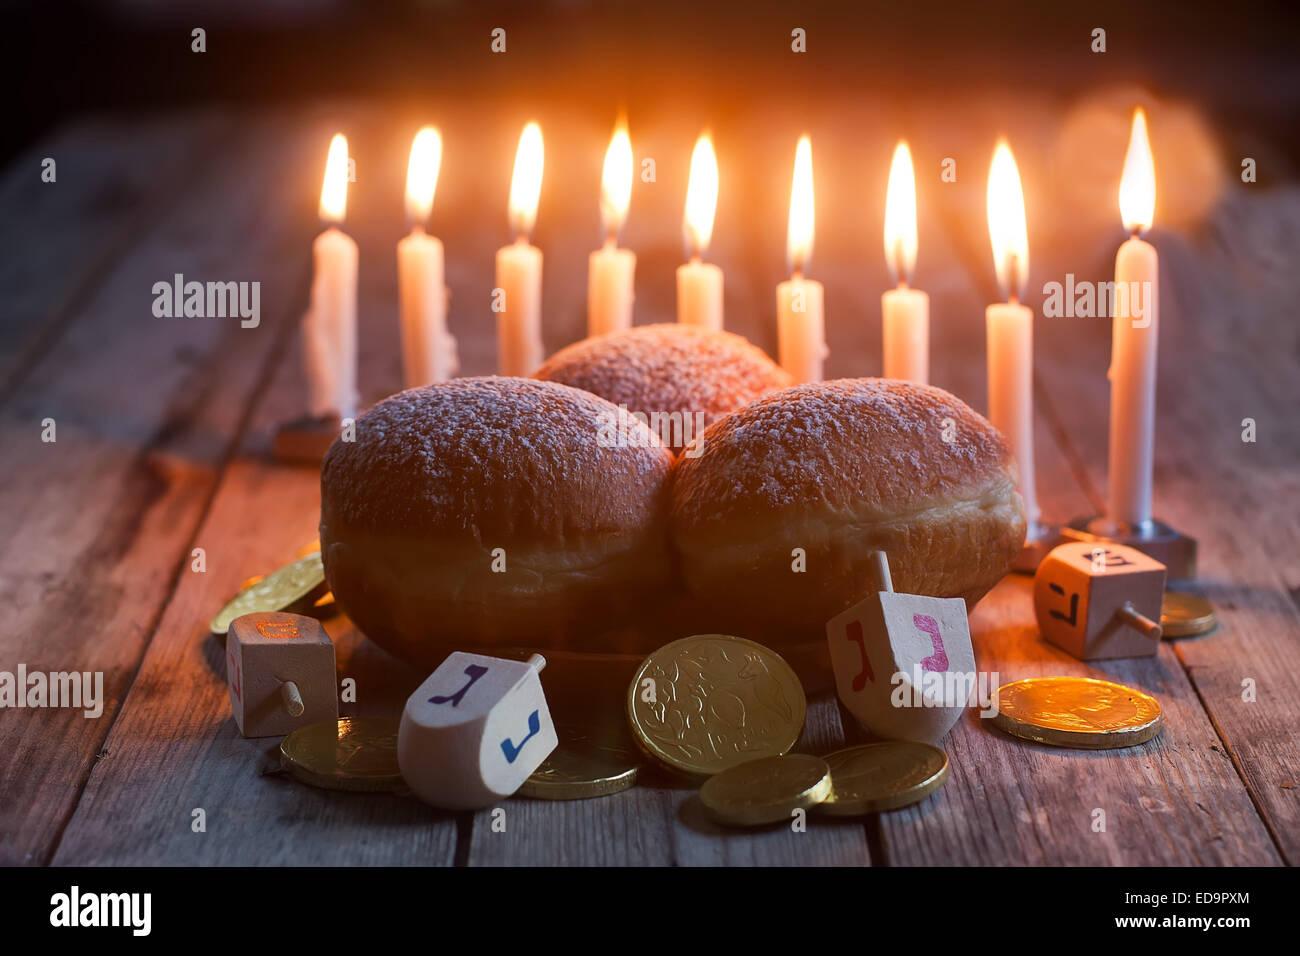 Jewish holiday hannukah symbols - menorah, doughnuts, chocolate coins and wooden dreidels. - Stock Image